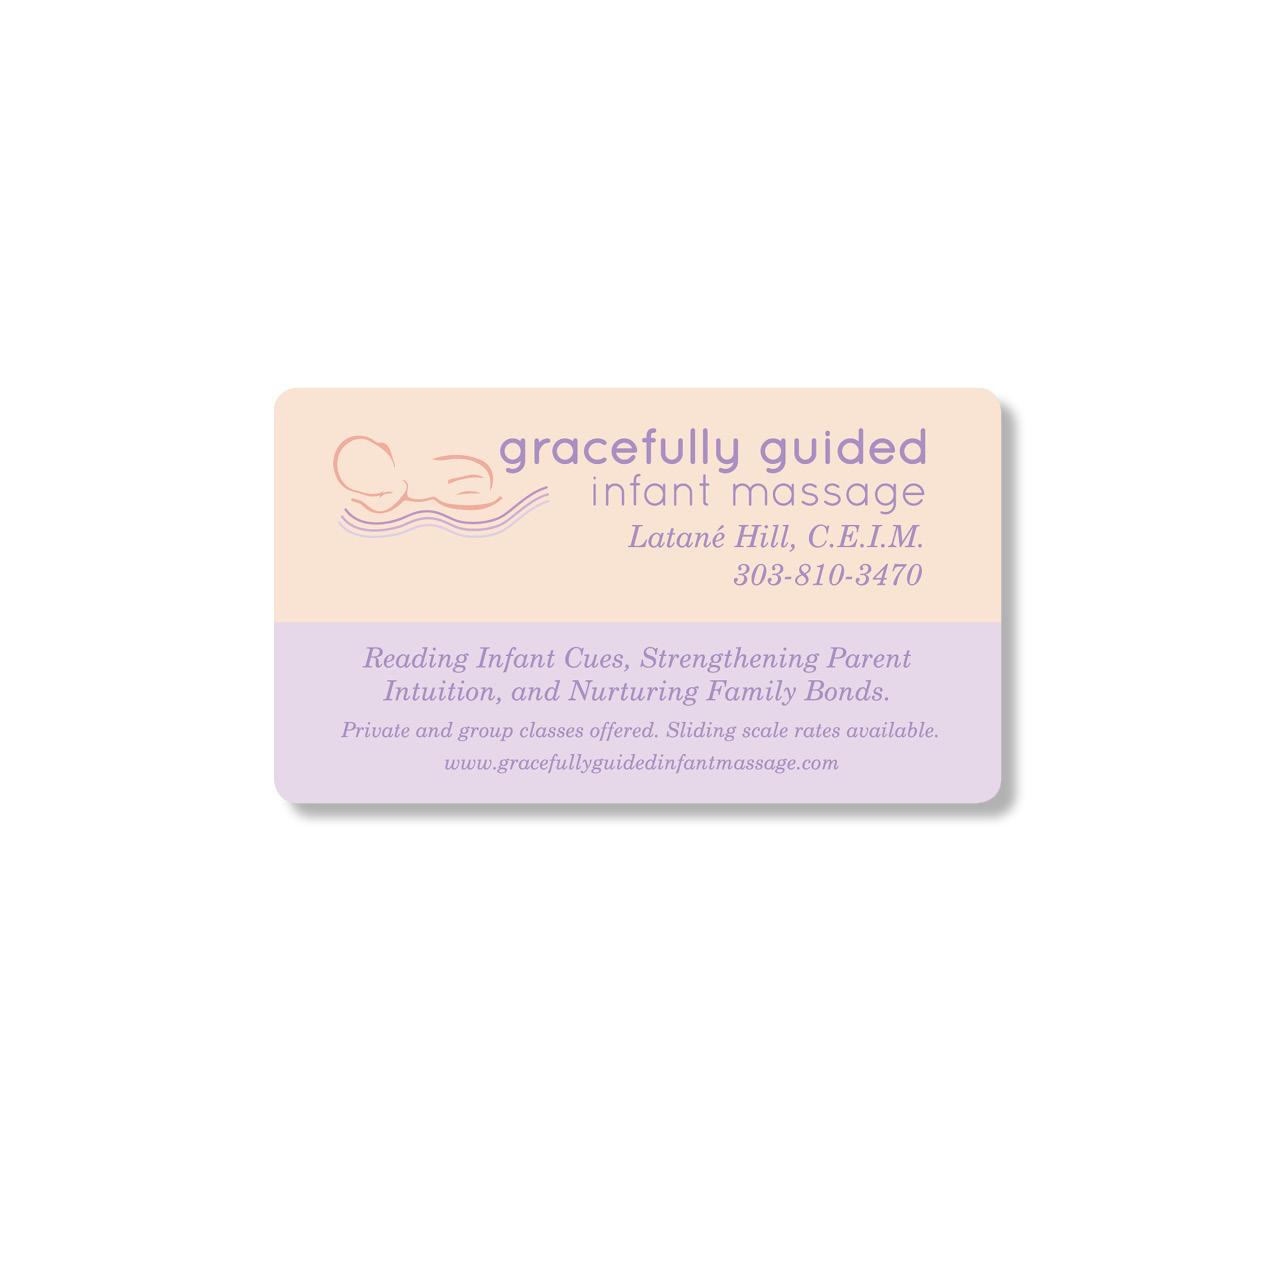 26 feminine business card designs adult business card design business card design by kl for this project design 4949287 reheart Choice Image